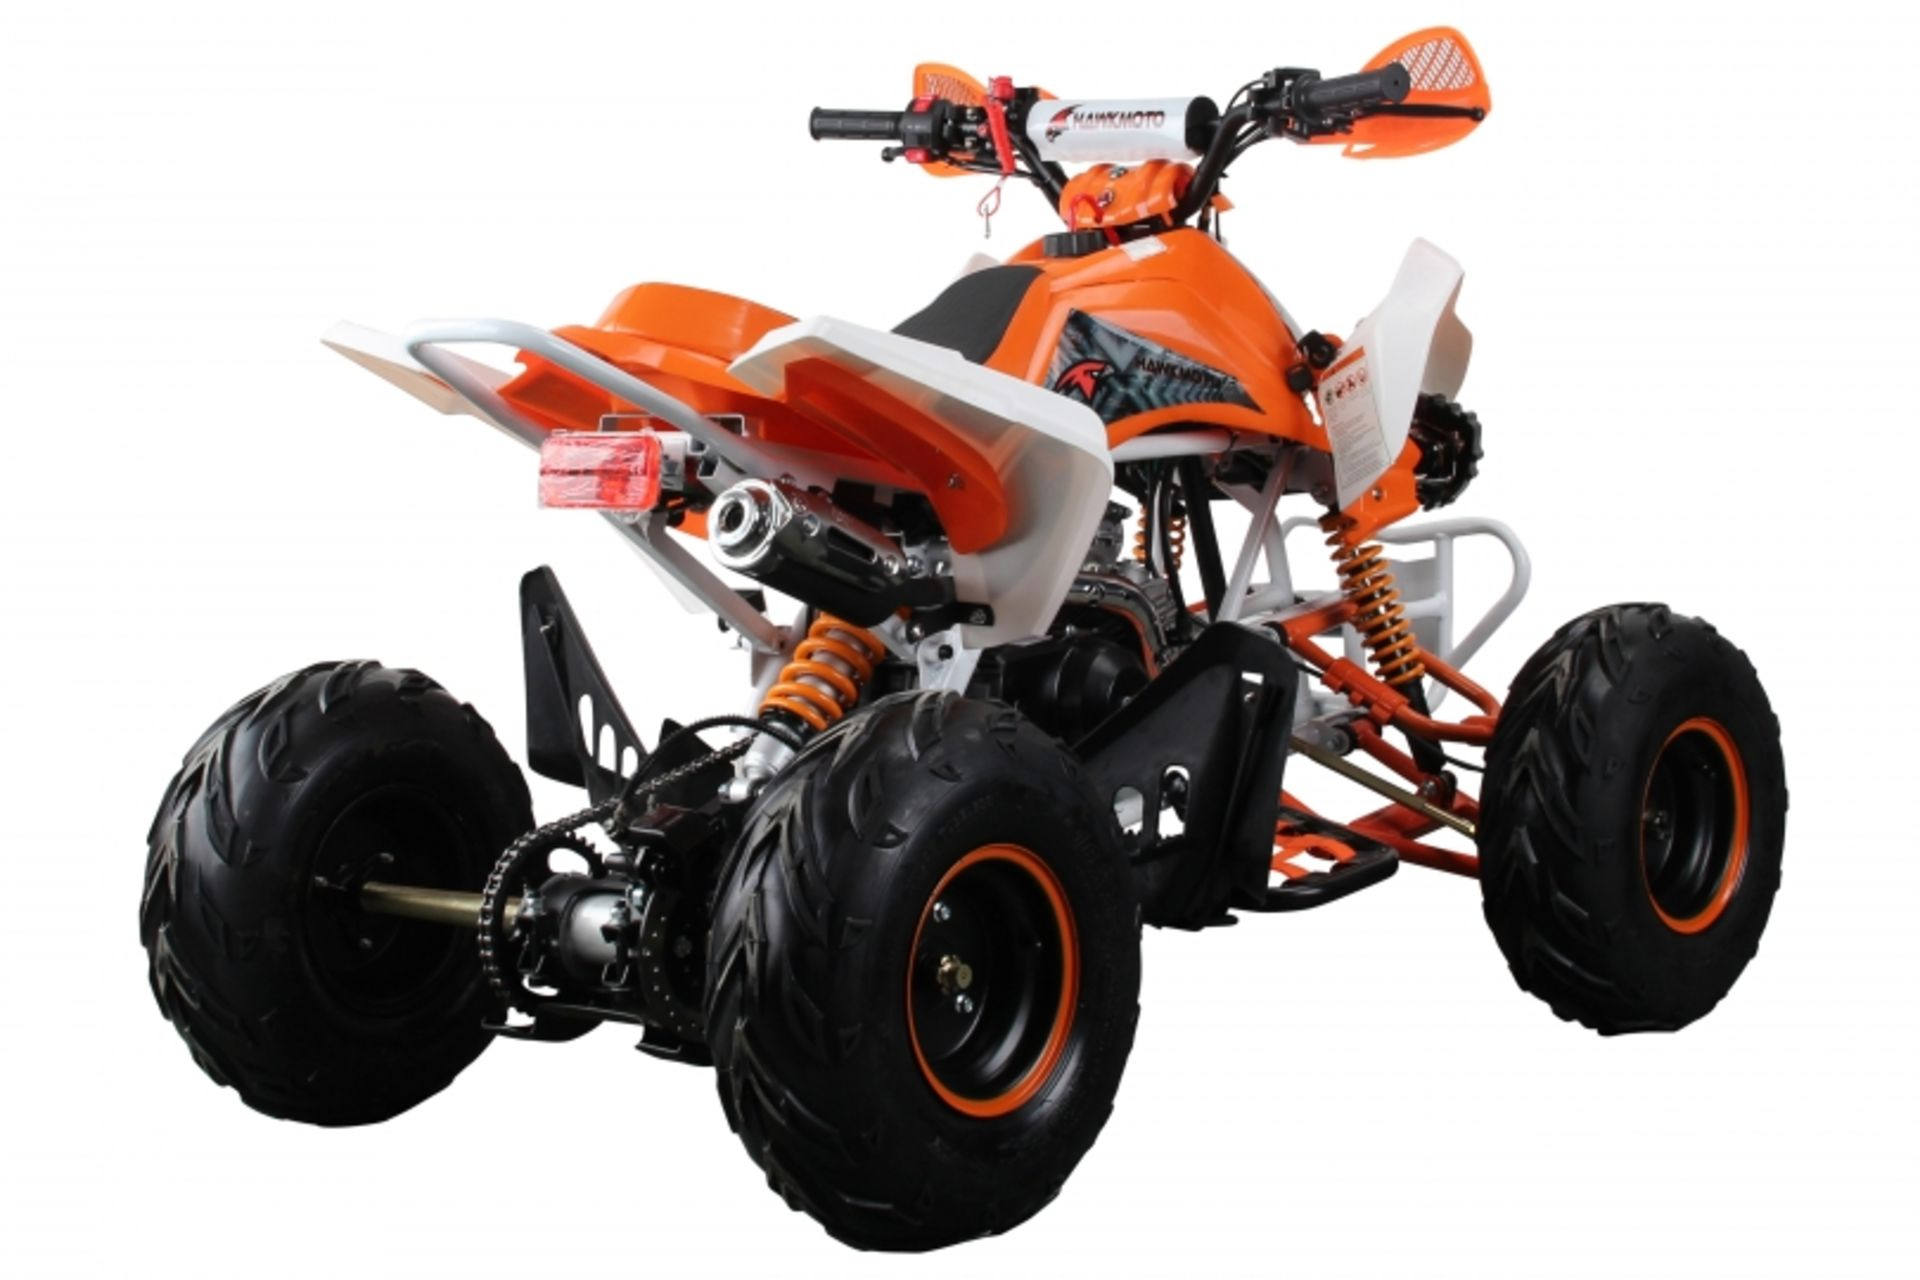 Lot 23531 - V Brand New 125cc Interceptor SV2 4 Stroke Quad Bike With Reverse Gear - Double Front Suspension/